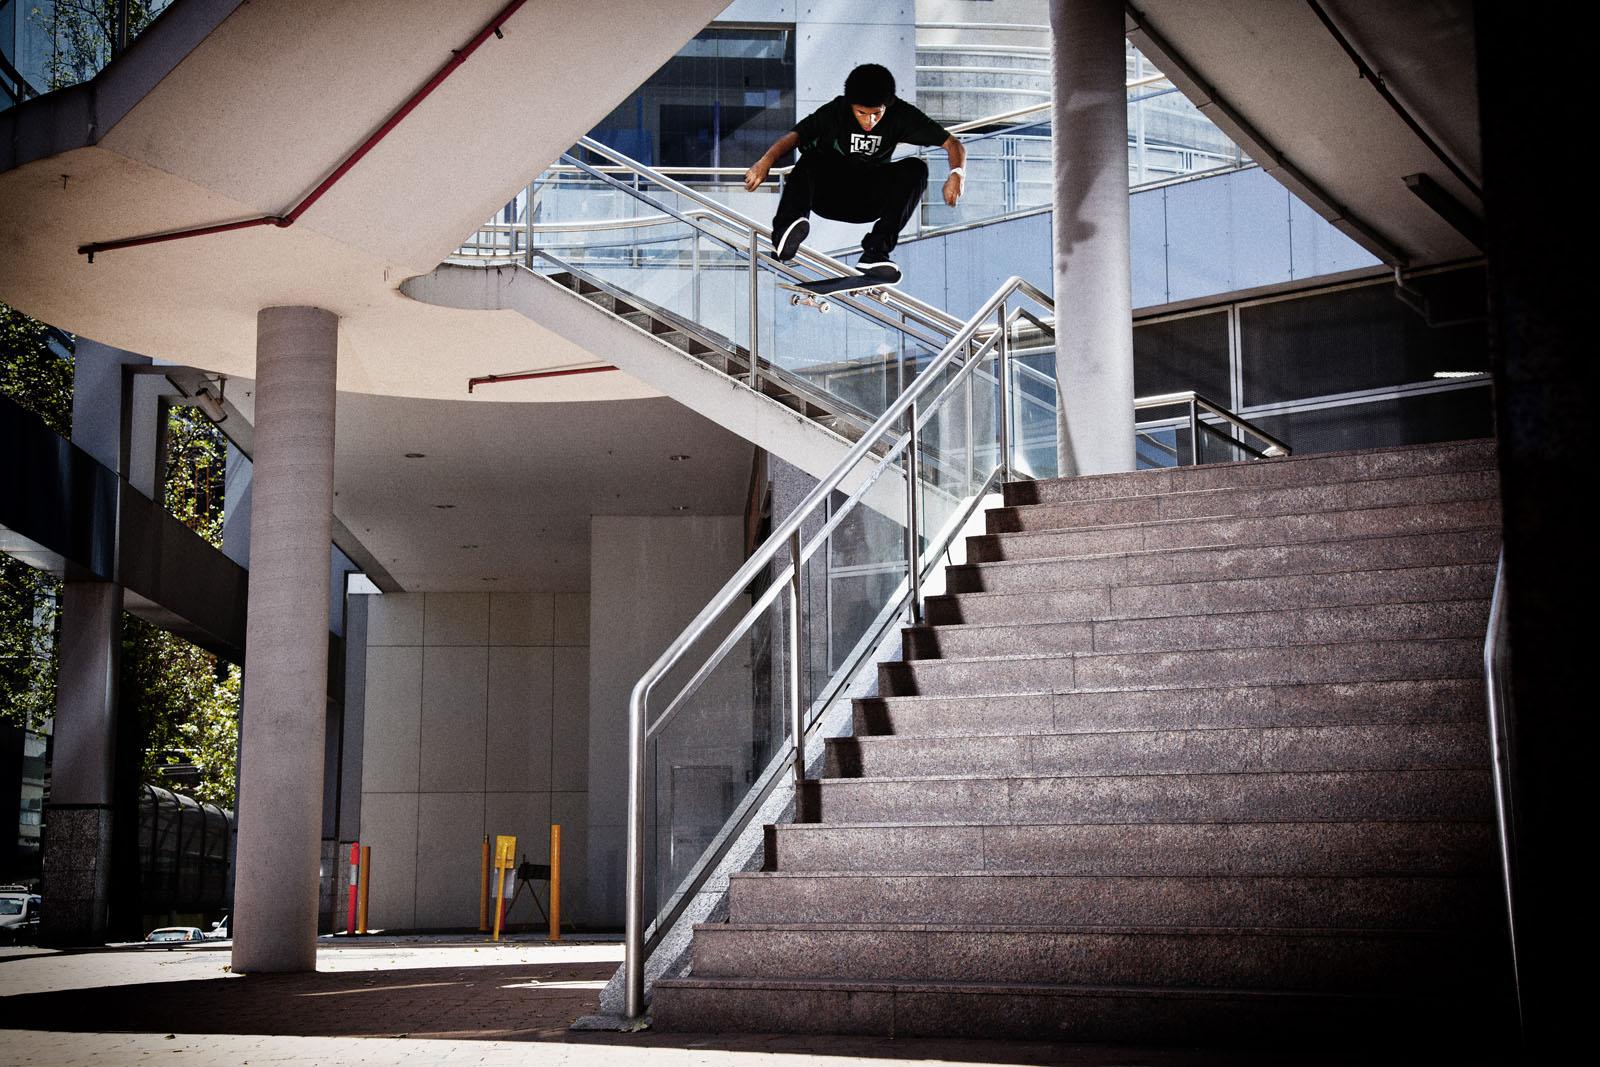 Kevin Romar Shad Lambert Kickflip Photo